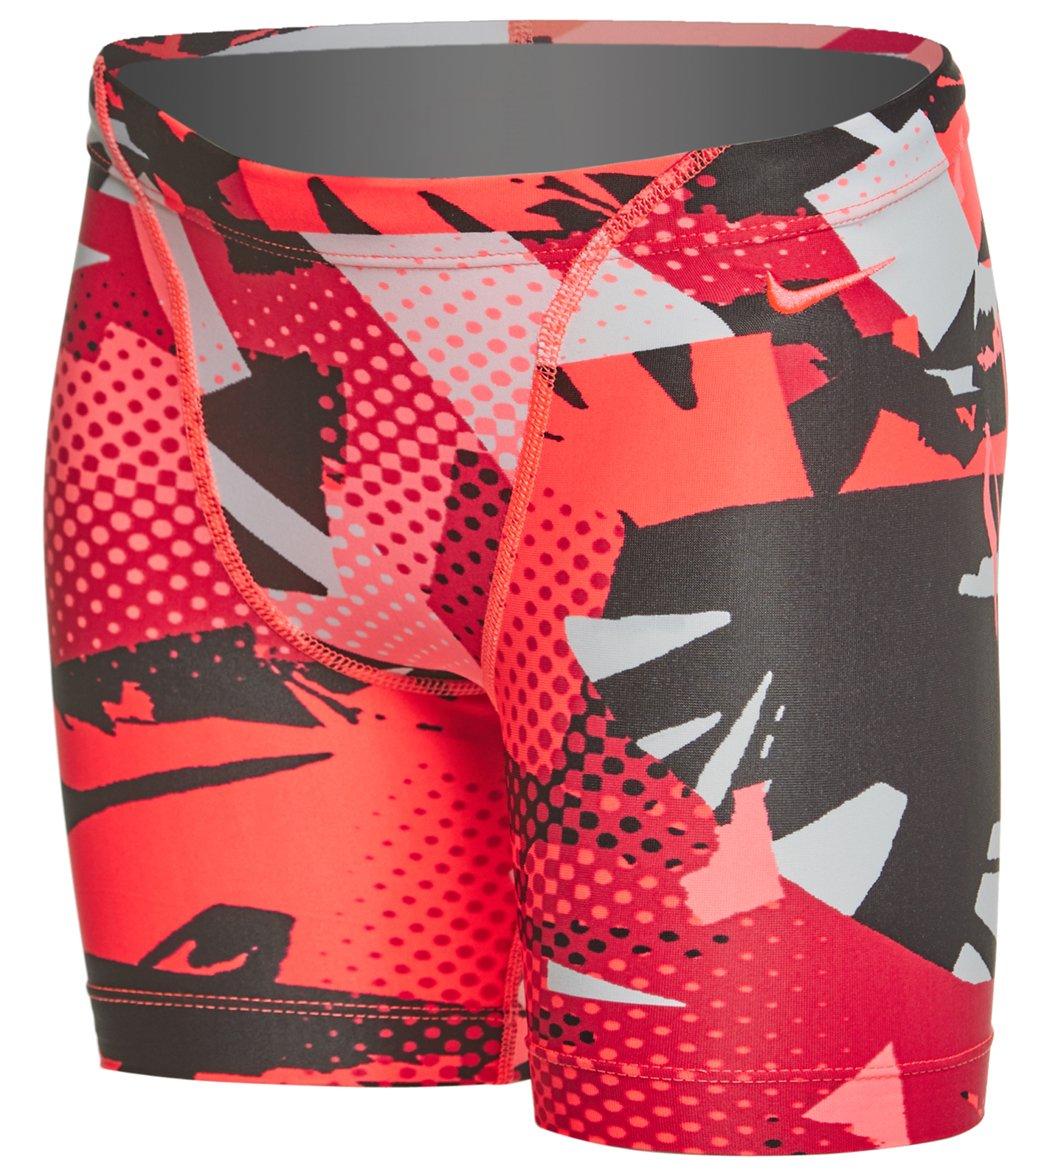 8ce7ba0706 Nike Boys' Drift Graffiti Jammer Swimsuit at SwimOutlet.com